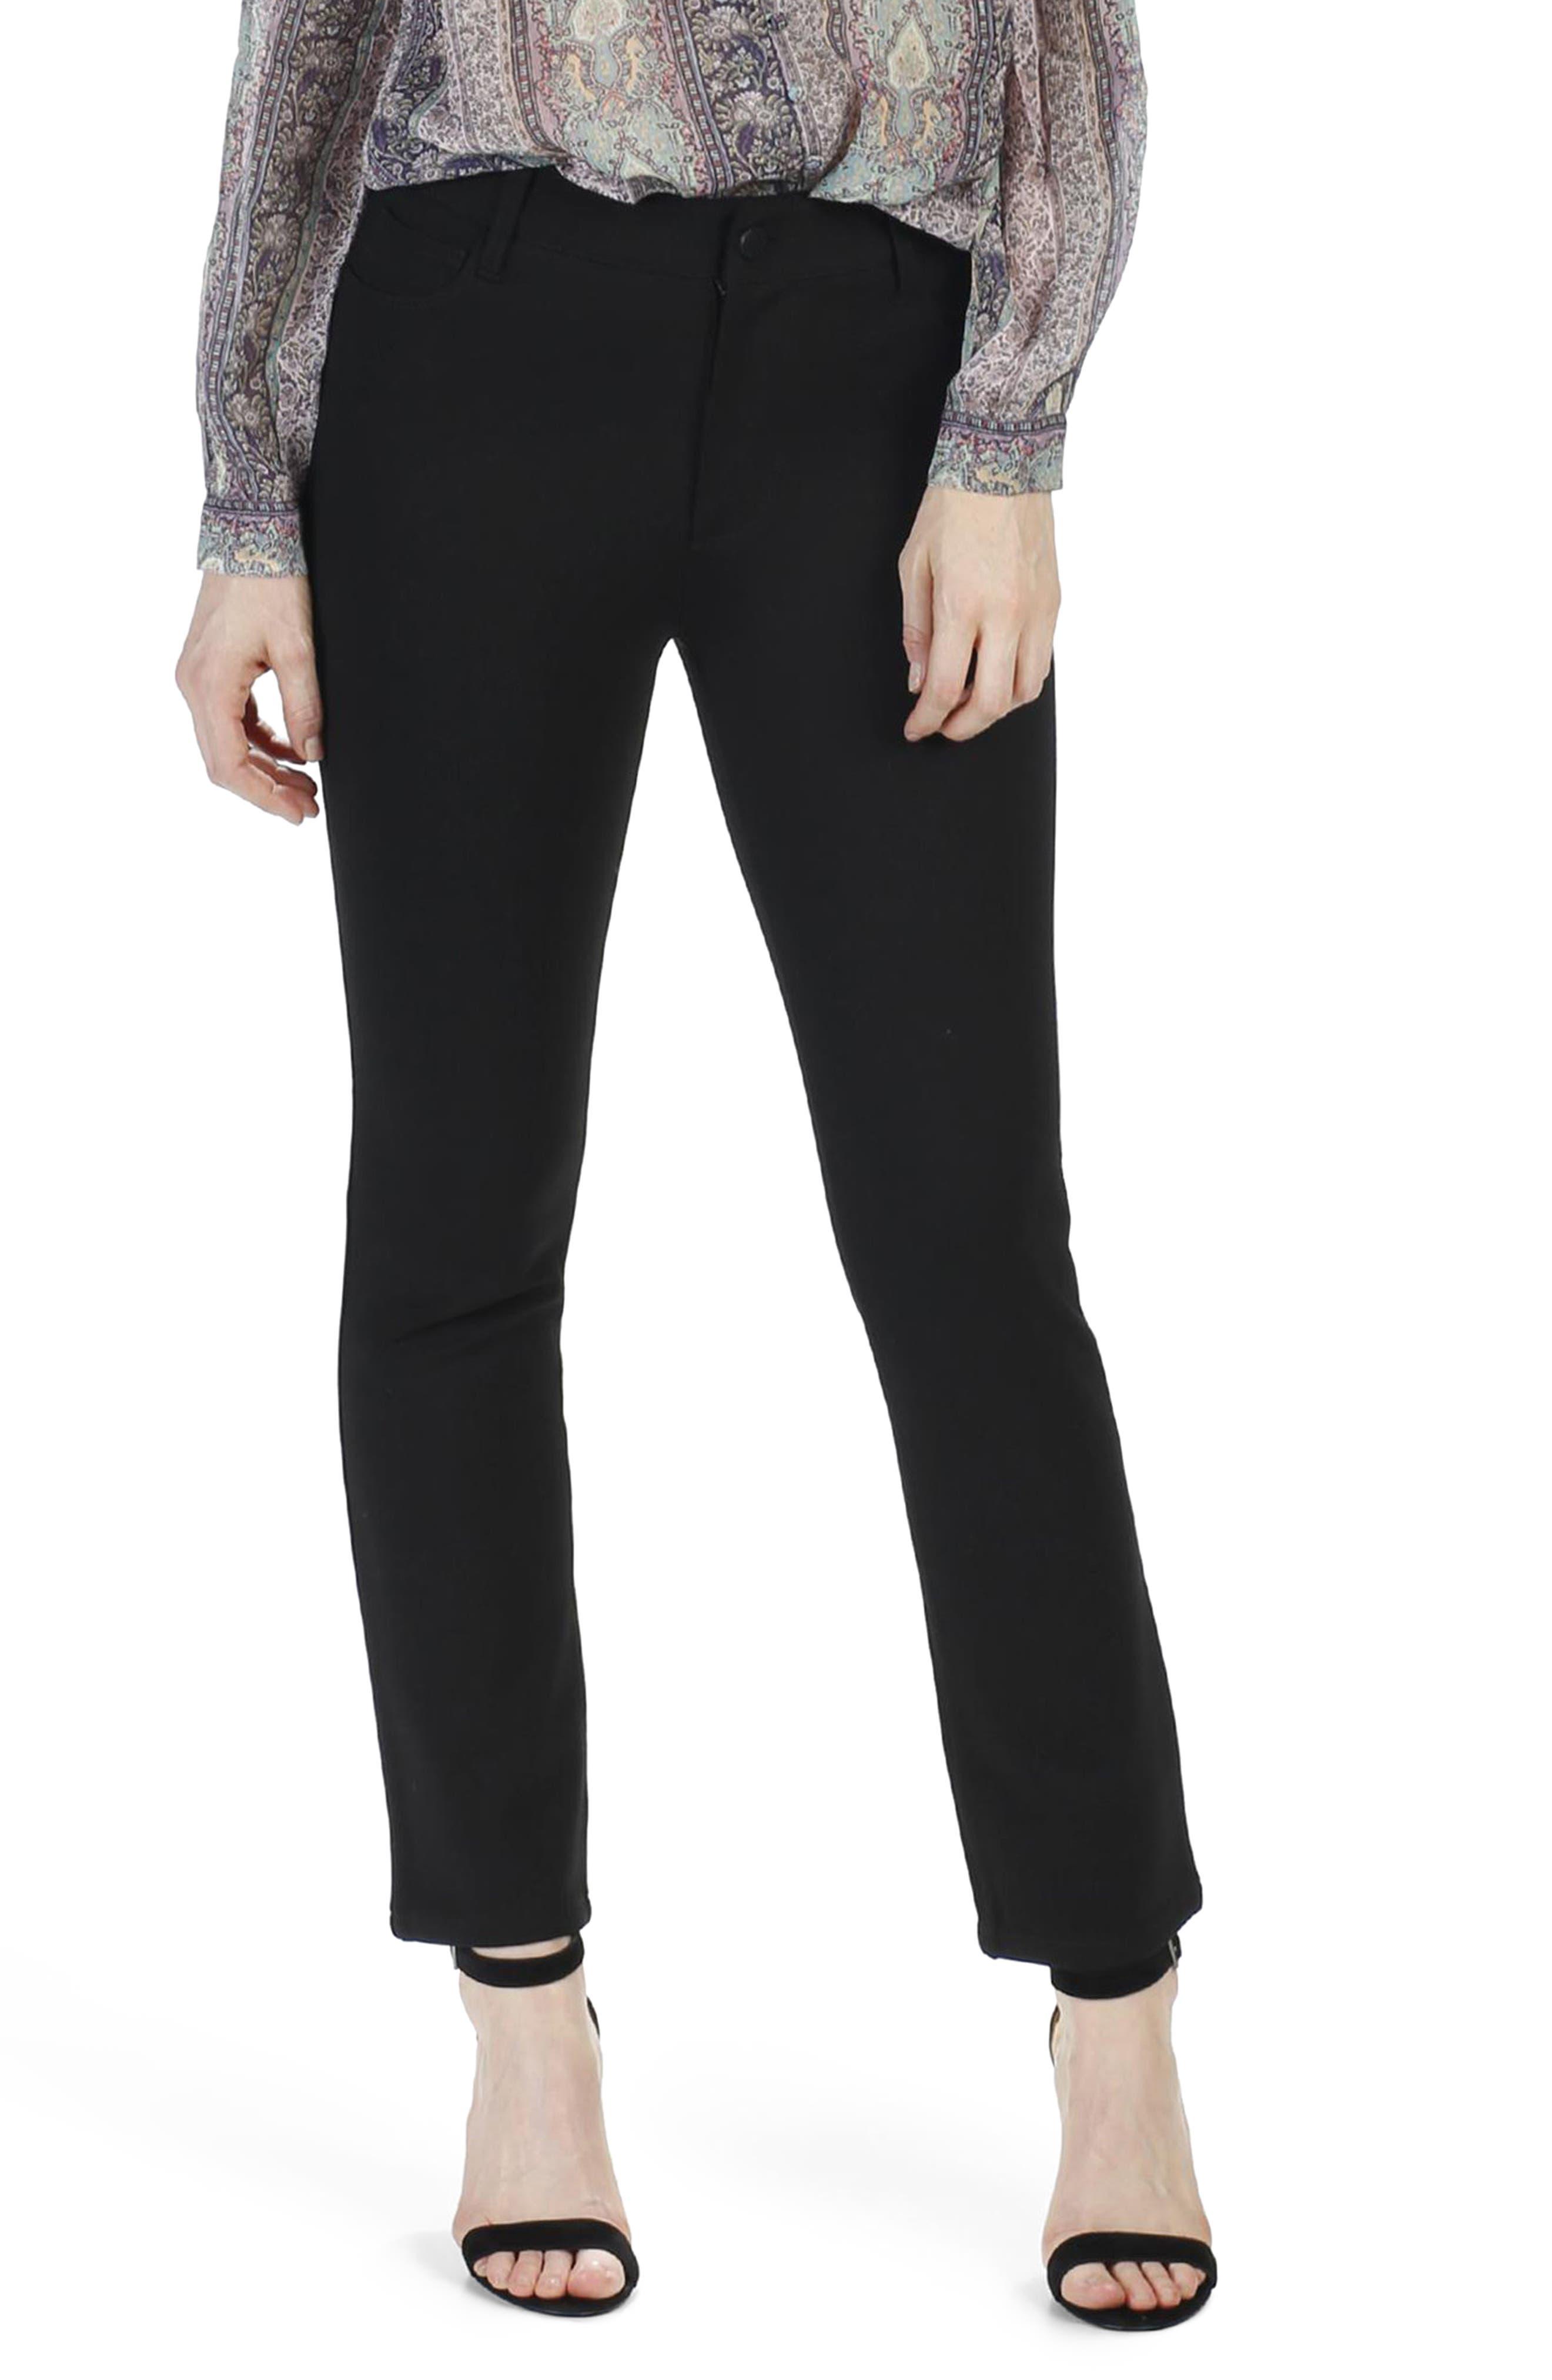 Alternate Image 1 Selected - PAIGE Jacqueline High Waist Crop Straight Leg Pants